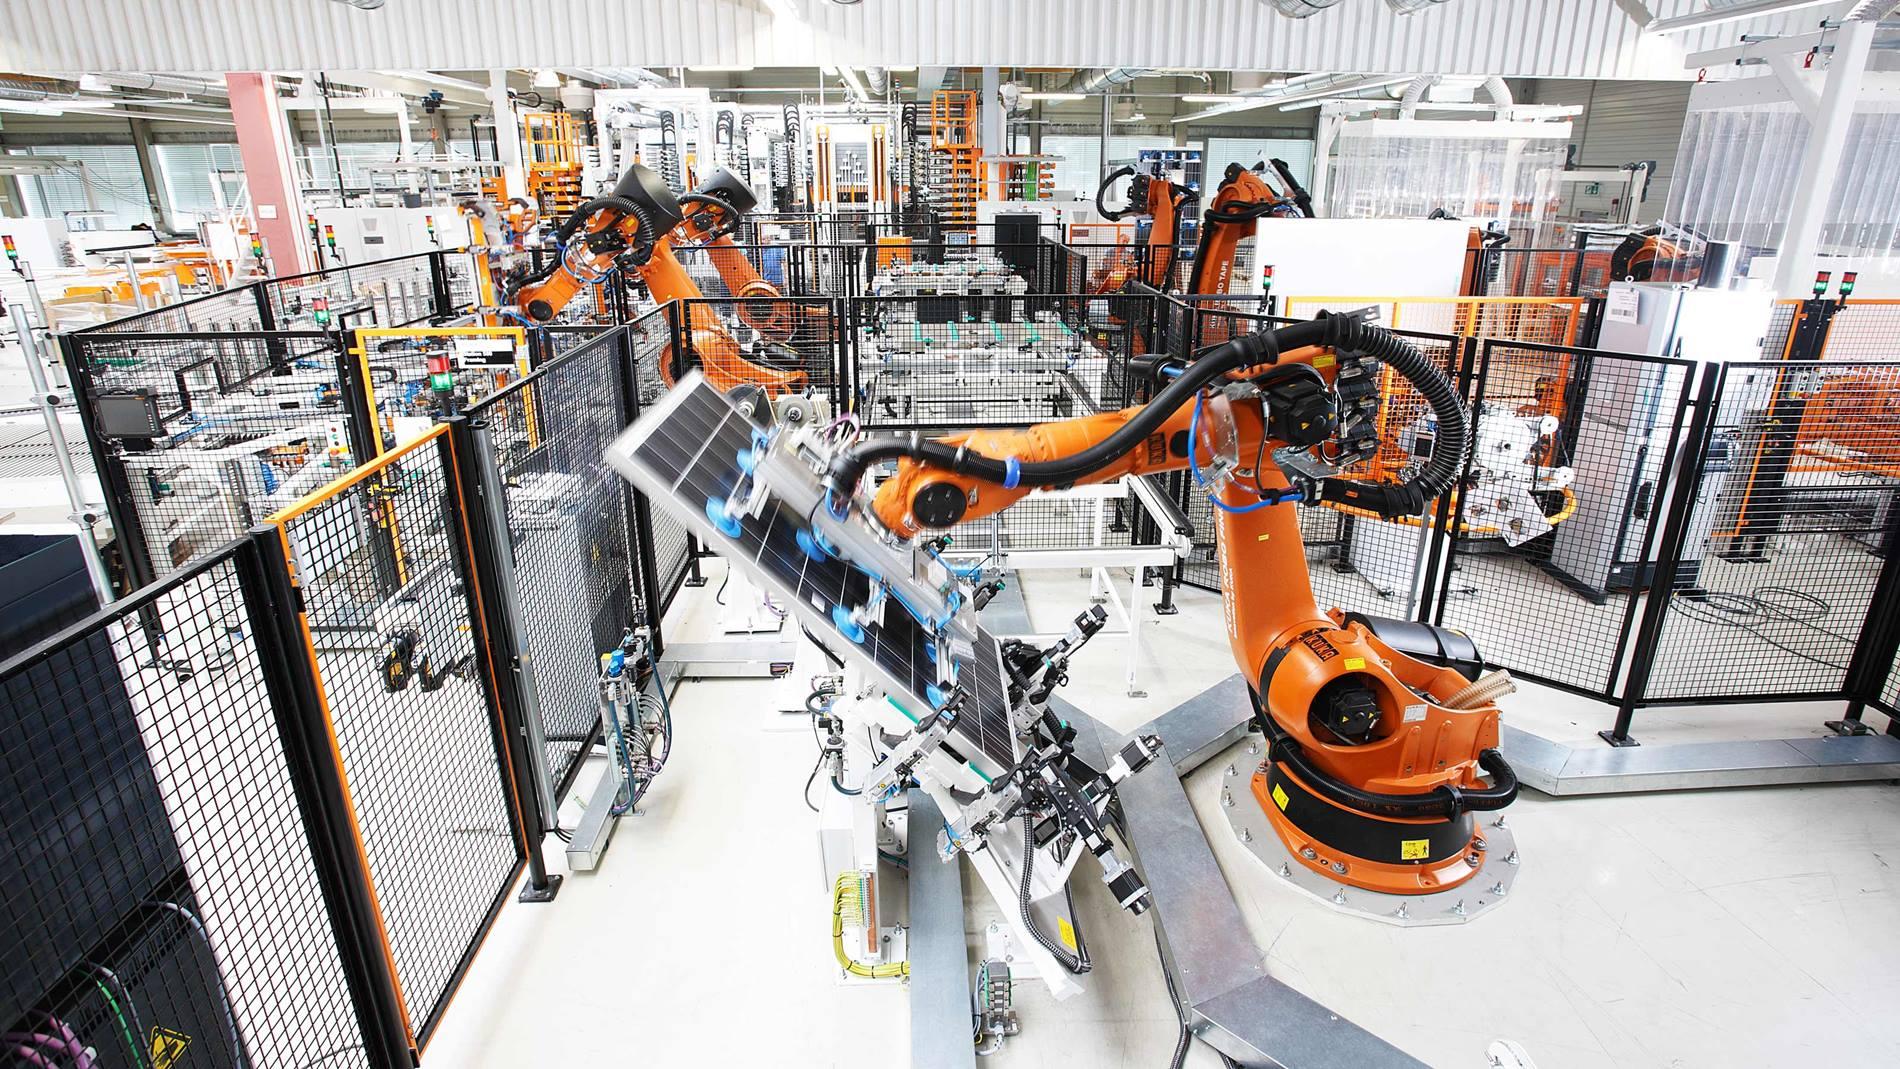 KUKA庫卡機器人搬運太陽能電池板  X Robotics愛科思機器人x-ltd.com